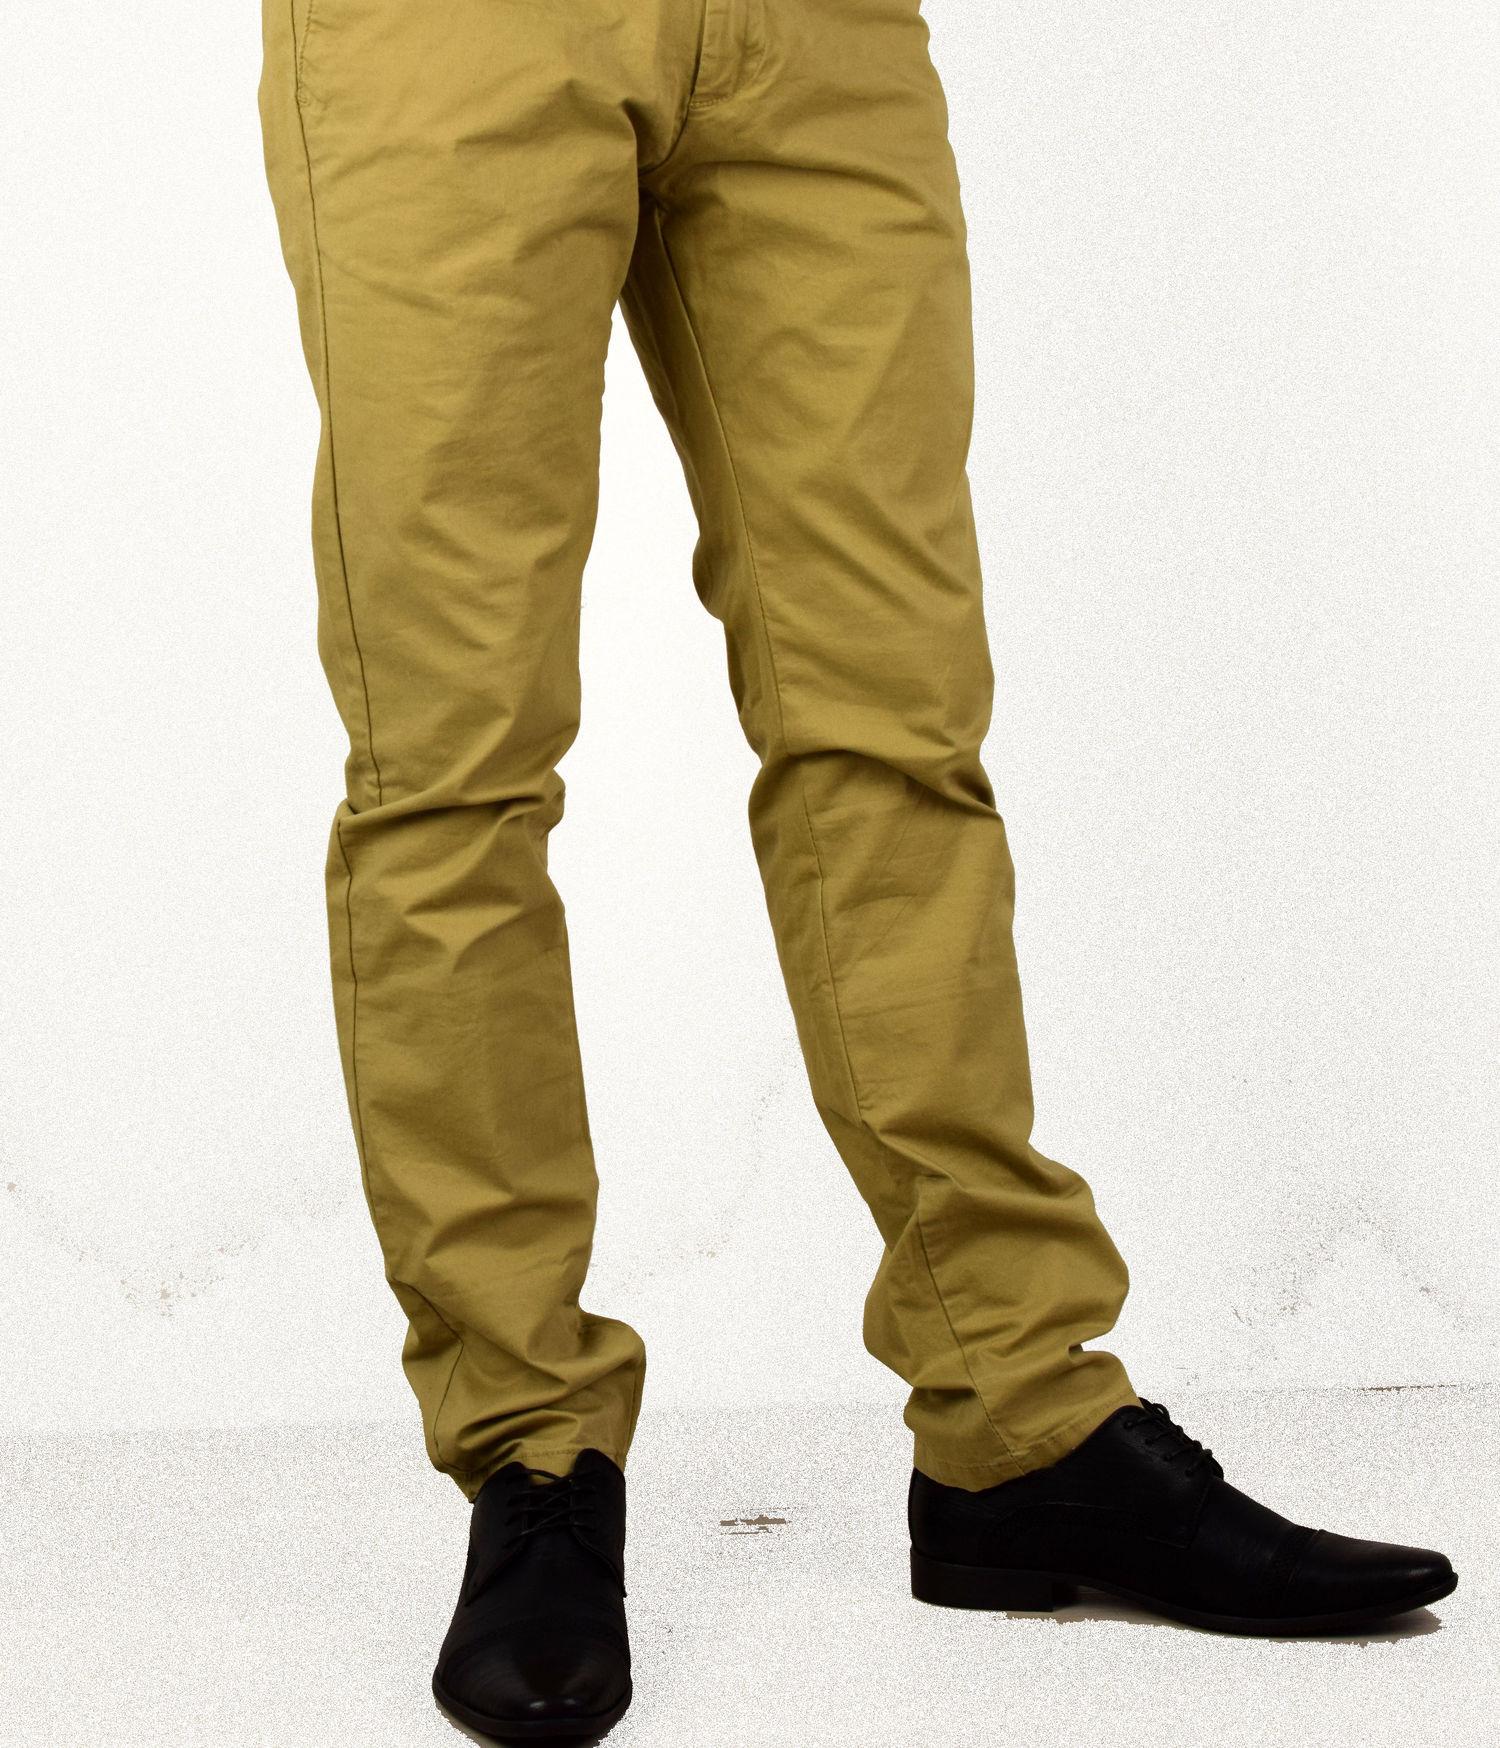 c1278477365 Спортно - елегантен мъжки панталон - 1005 - бежов - Alis.bg - Fashion